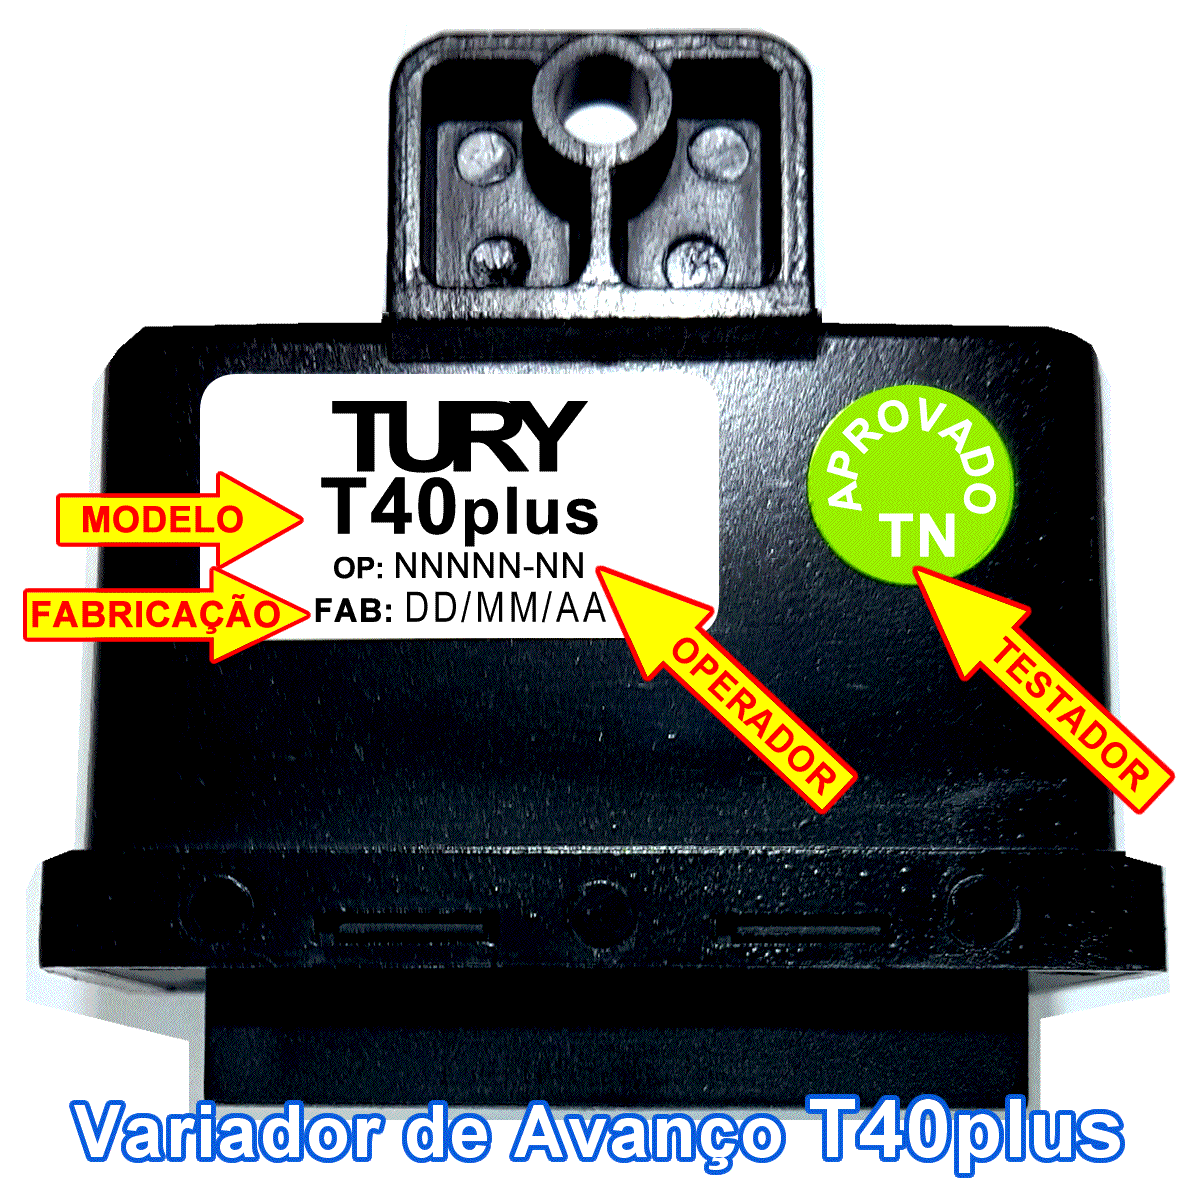 Variador de Avanço Suzuki e Tracker T40 Plus TURY GAS MAF